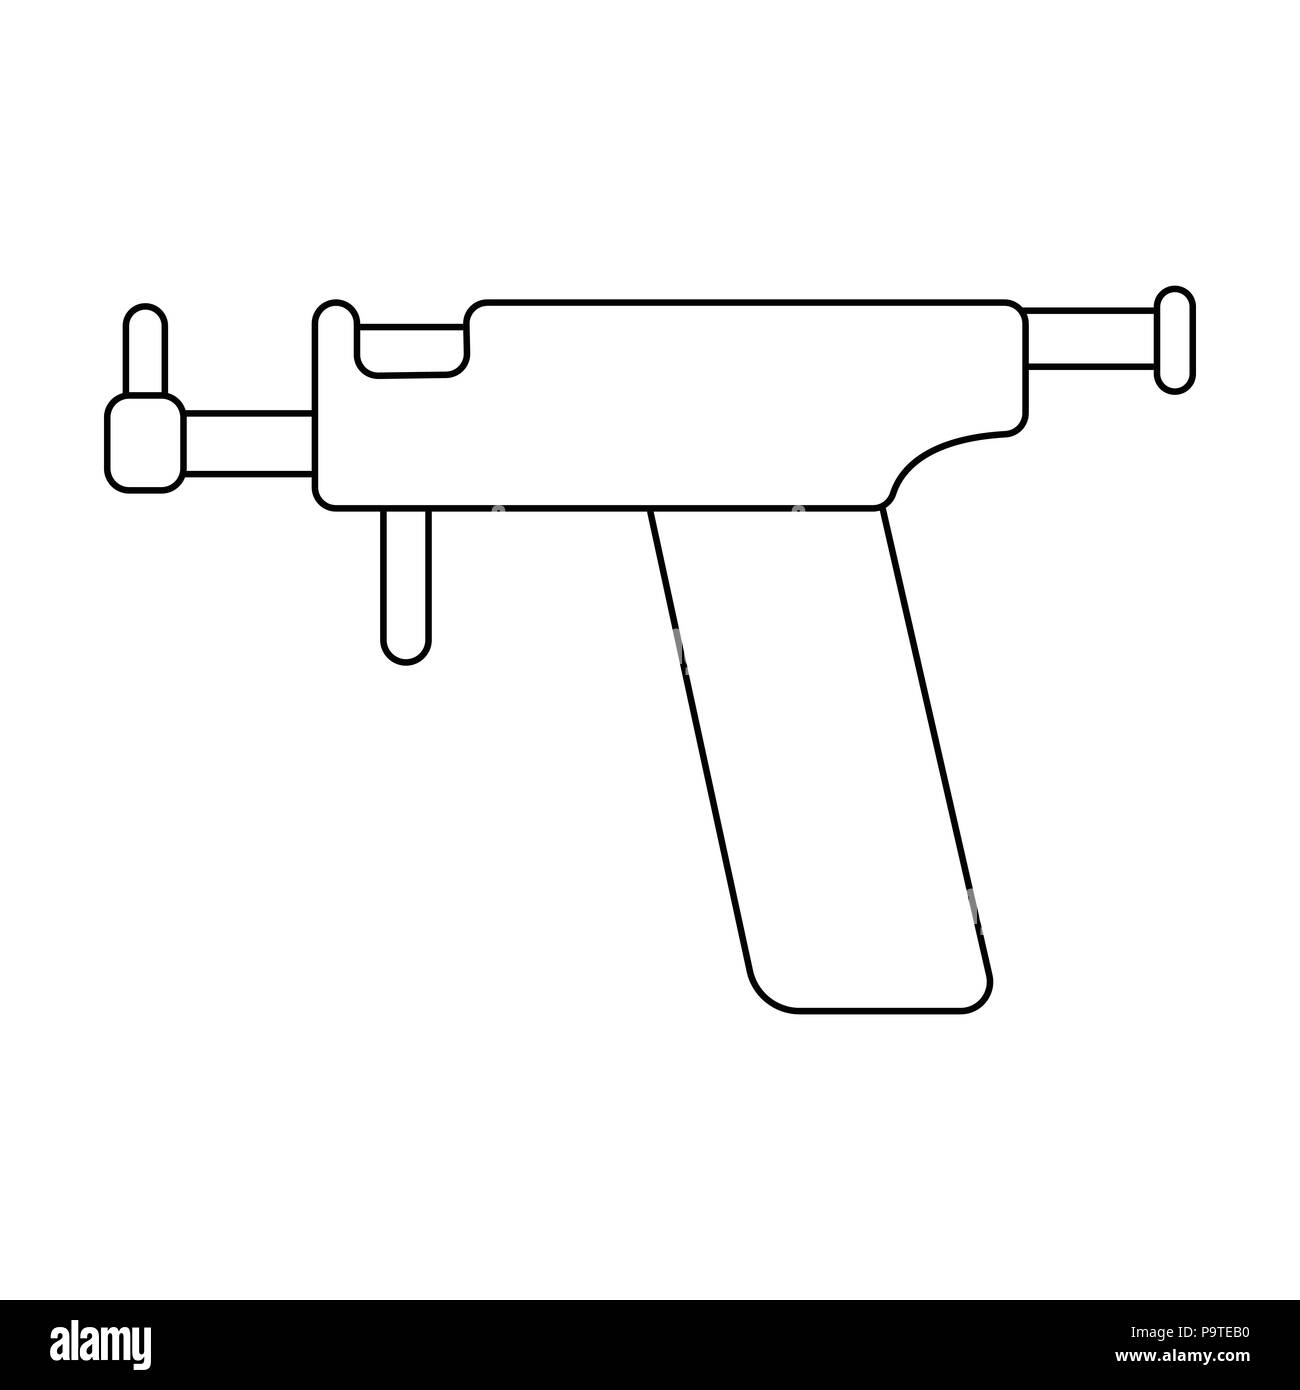 Tattoo Gun Icon Vector Vectors Stock Photos & Tattoo Gun